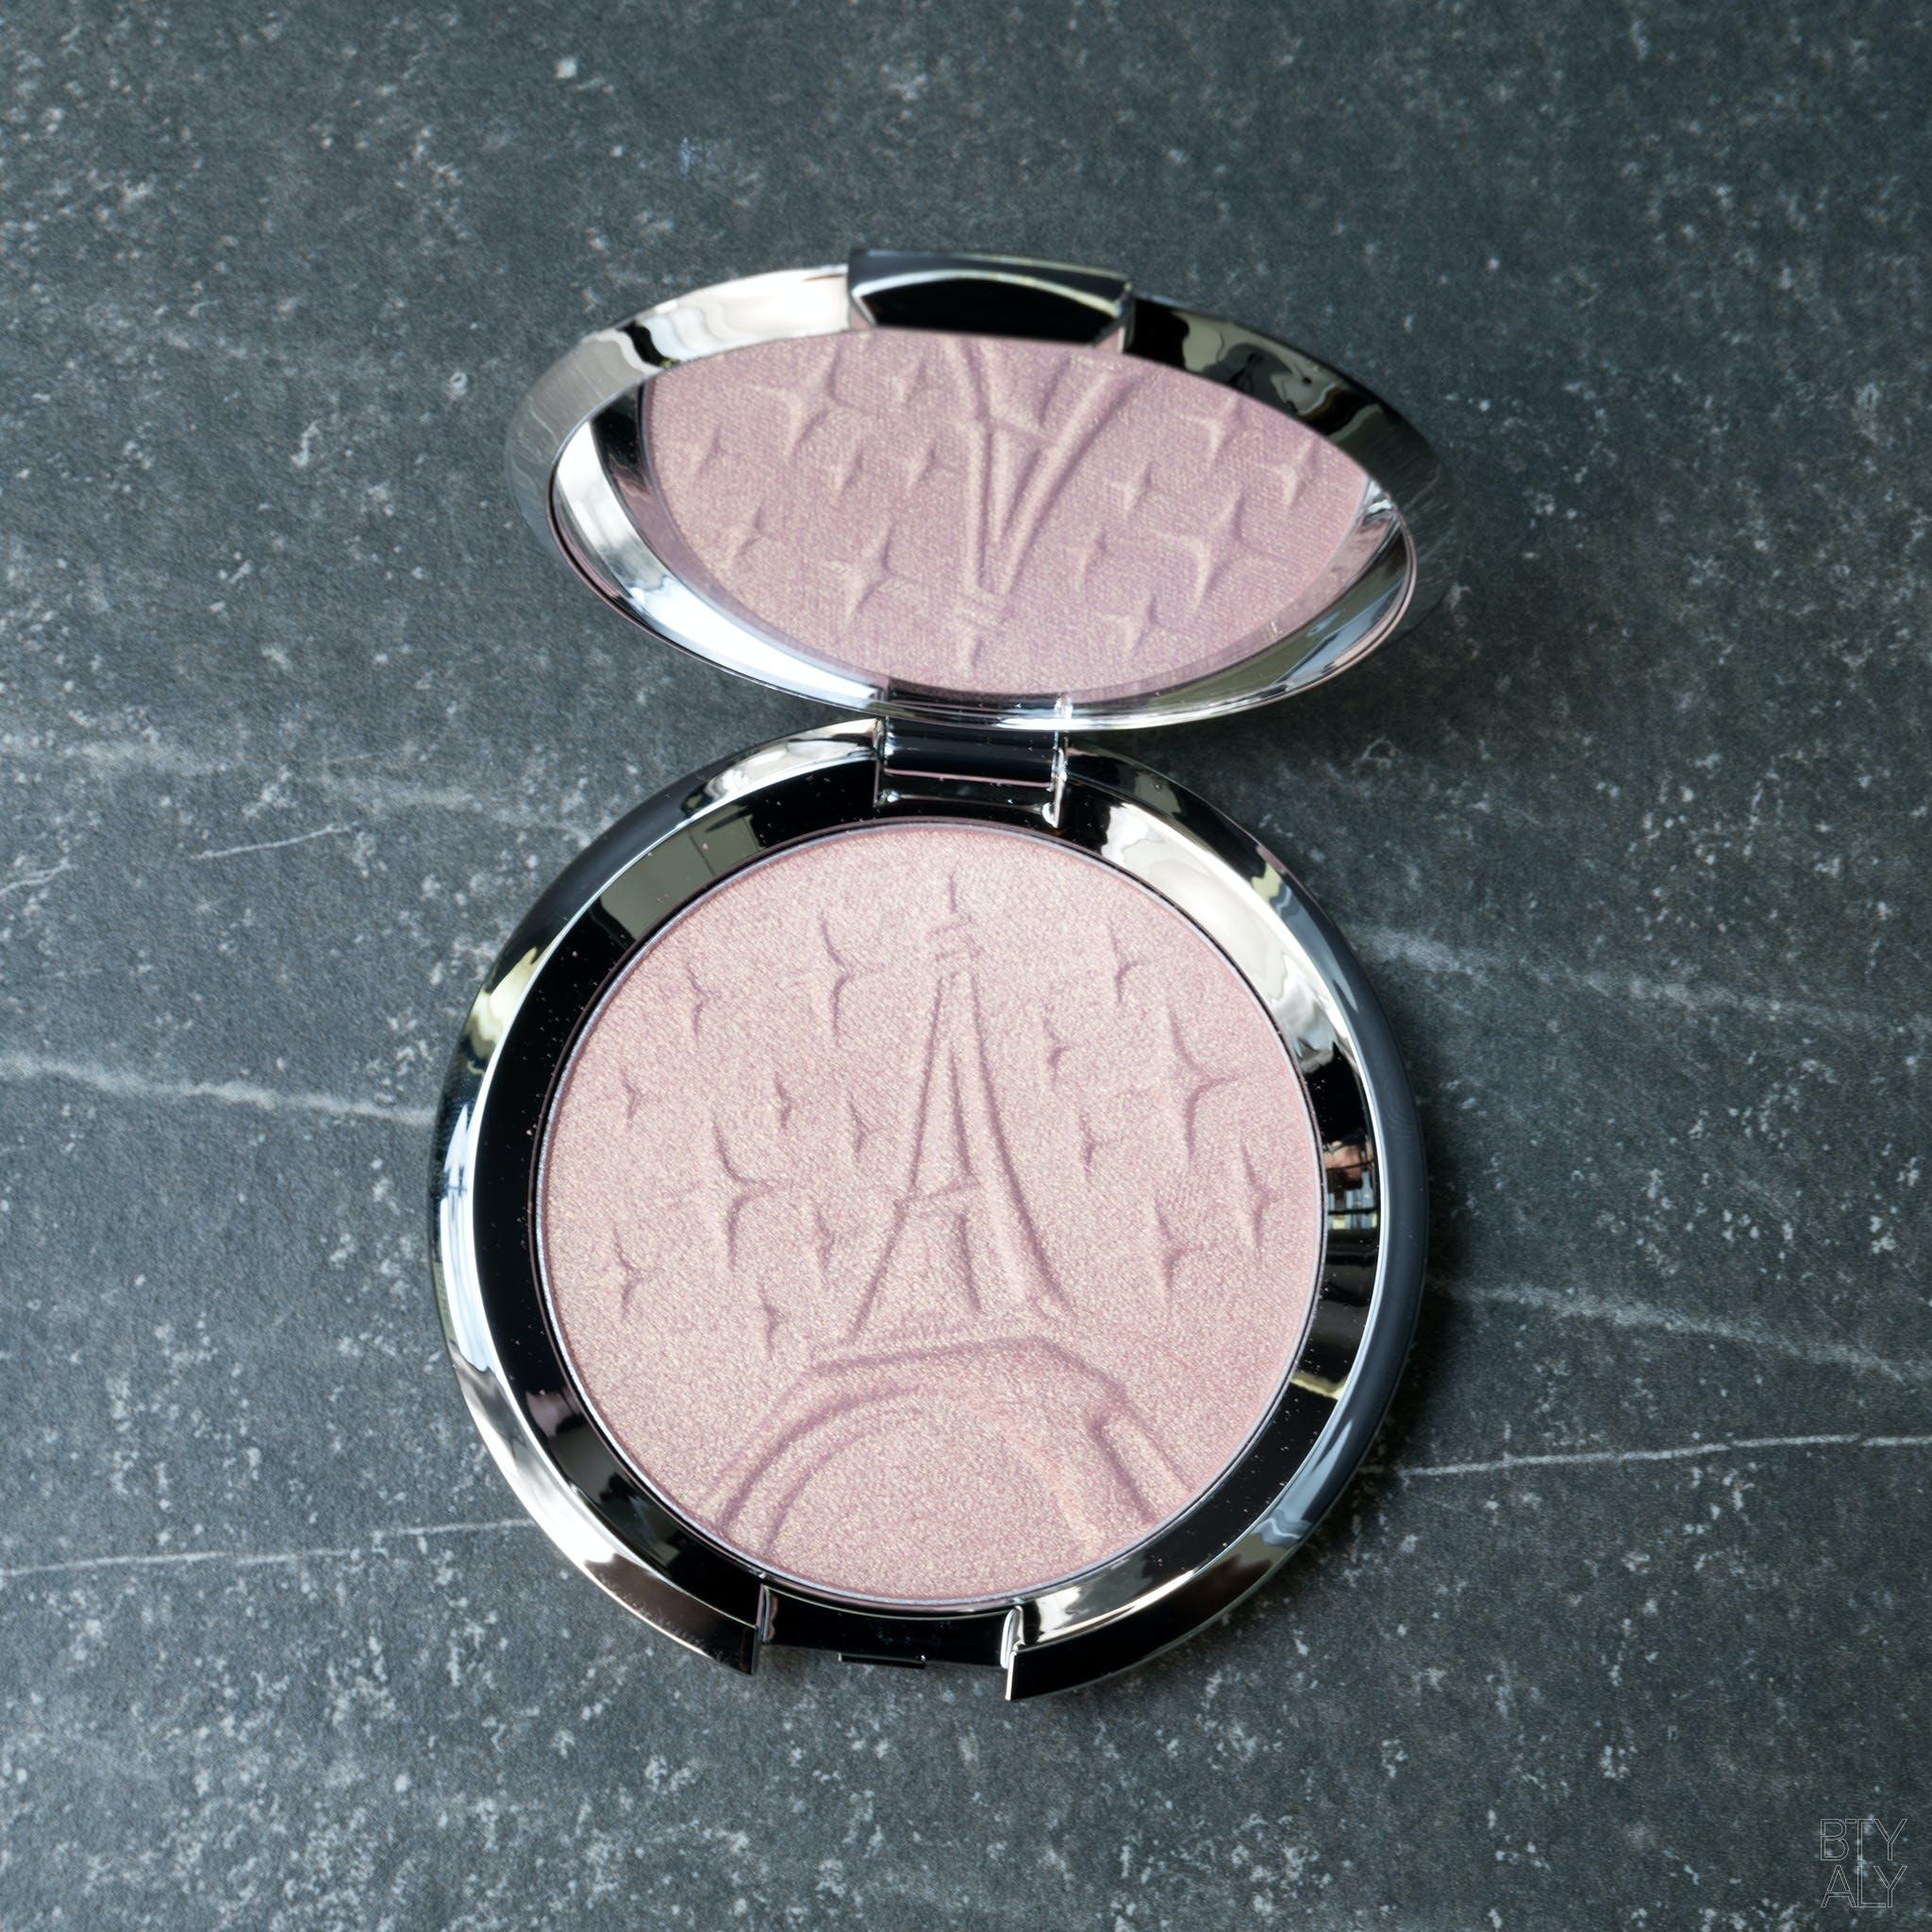 Becca Shimmering Skin Perfector Pressed Parisian Lights